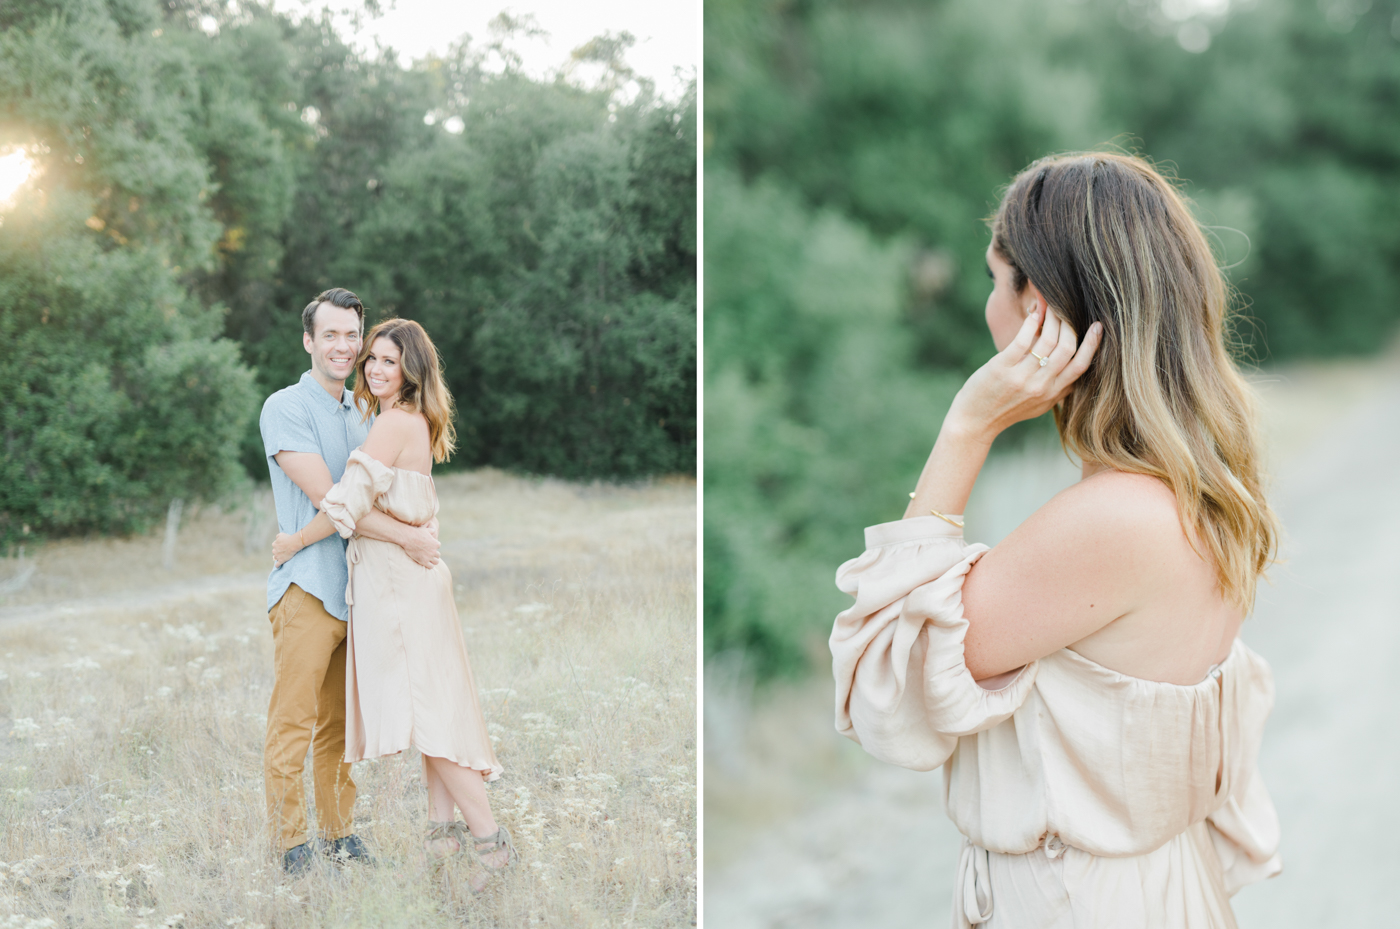 Malibu_Creek_State_Park_Romantic_Engagement_Session_C&J_romantic-8.jpg